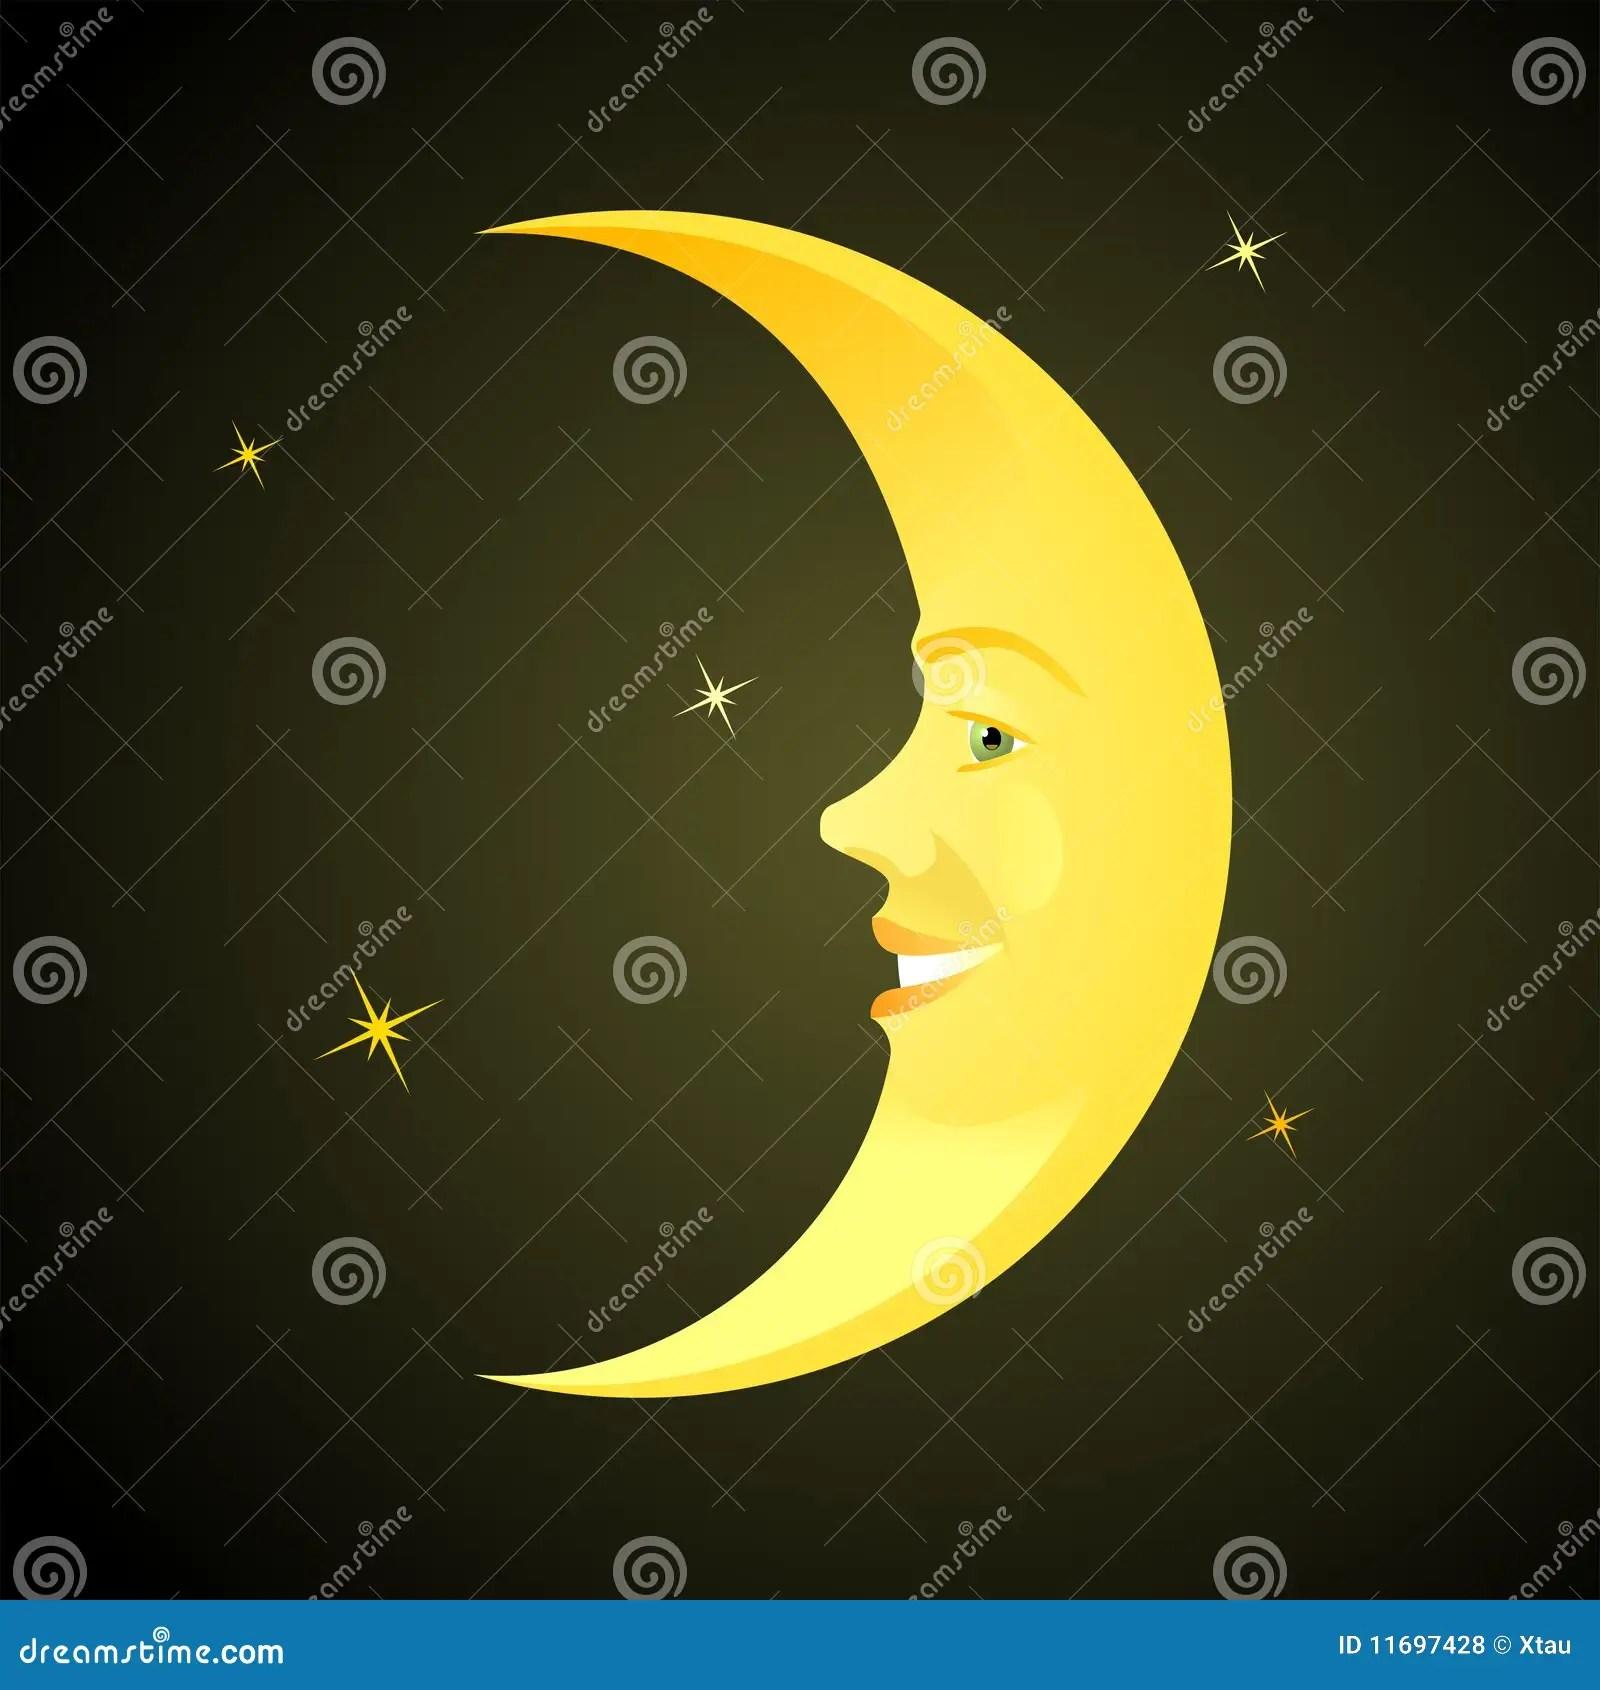 Cartoon Horned Moon Royalty Free Stock Photos Image